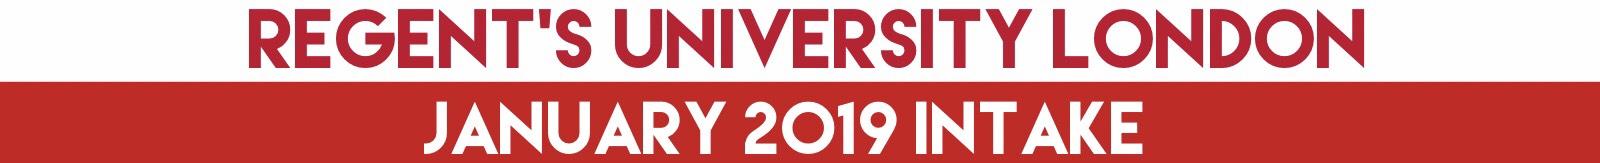 Regent's University London, UK เรียนต่อโทอังกฤษ January 2019 Intake